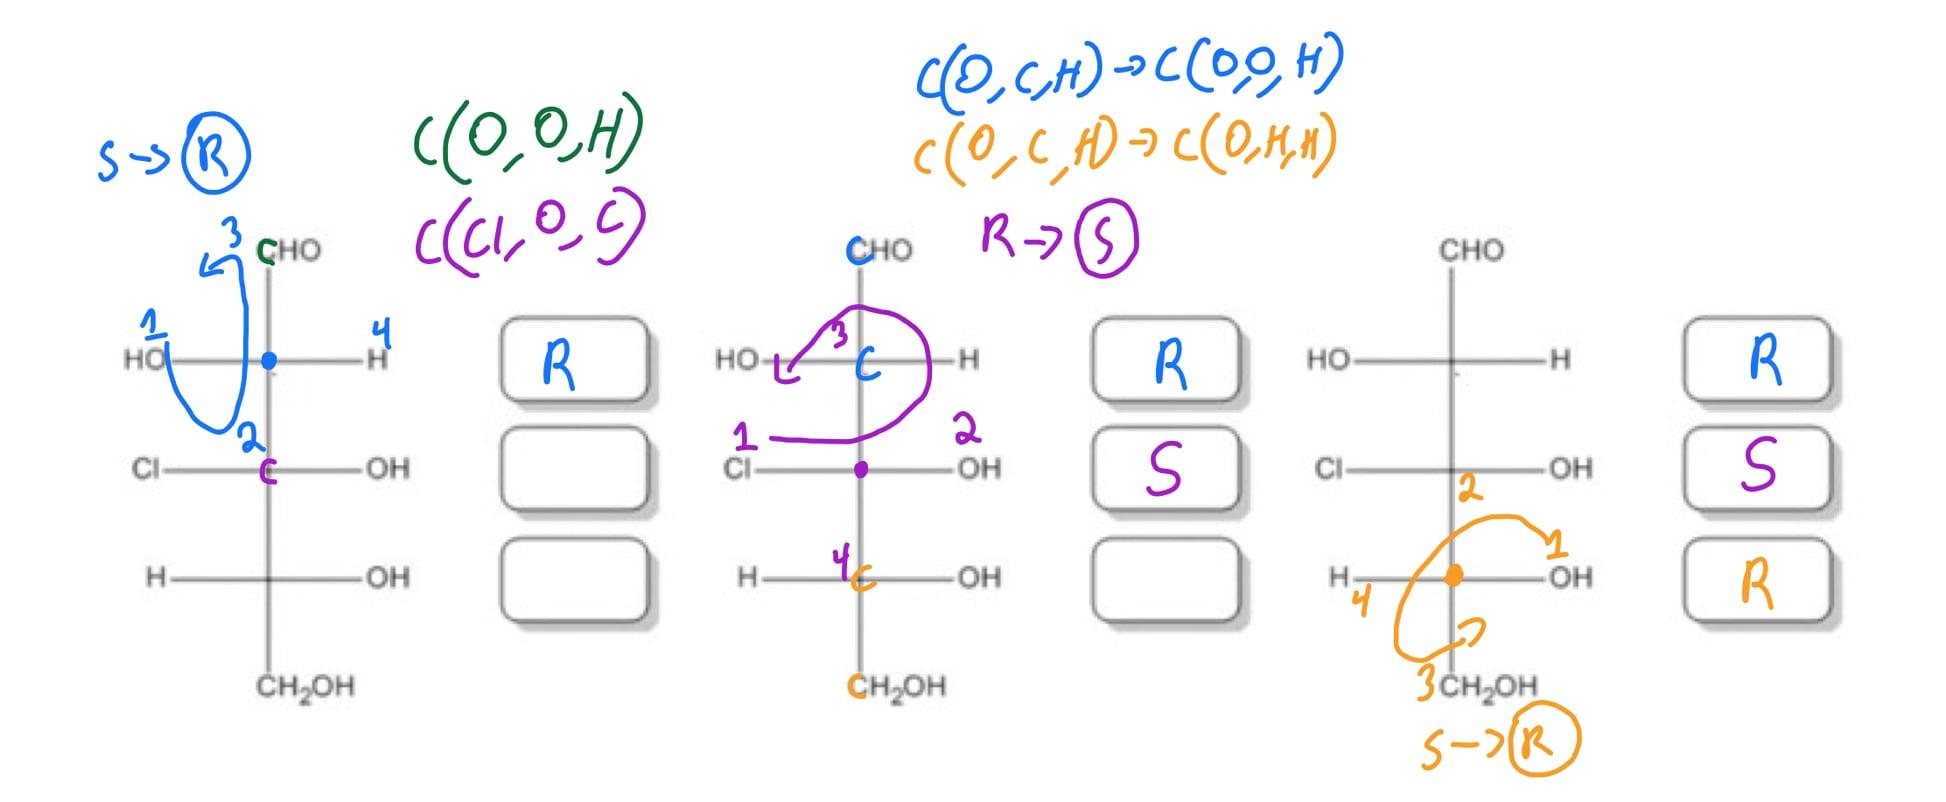 3-chloro-2,3,4,5-tetrahydroxypentanal with stereochemistry